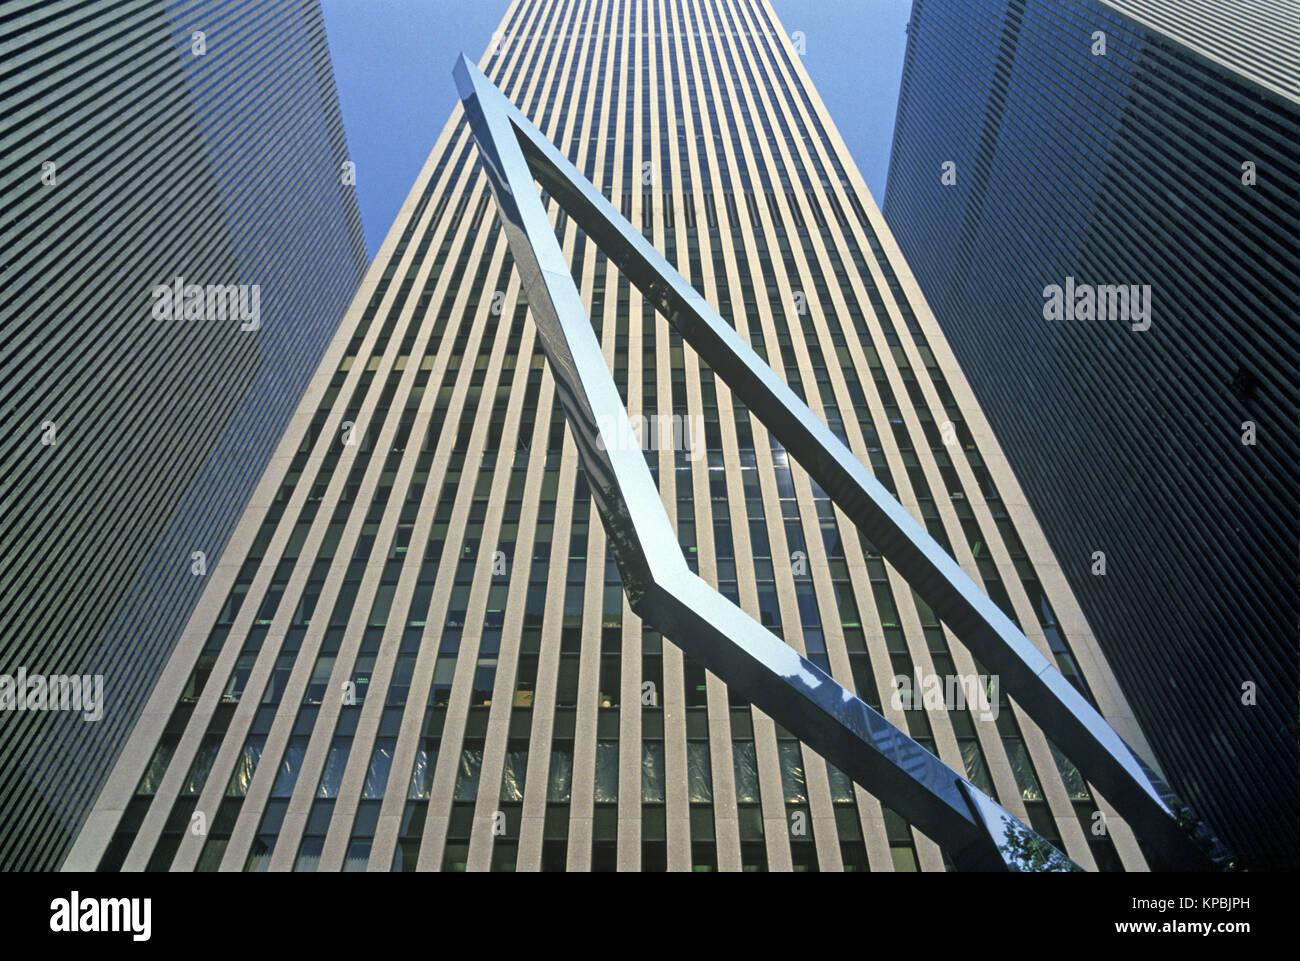 1987 HISTORICAL MCGRAW HILL BUILDING SIXTH AVENUE MANHATTAN NEW YORK CITY USA - Stock Image